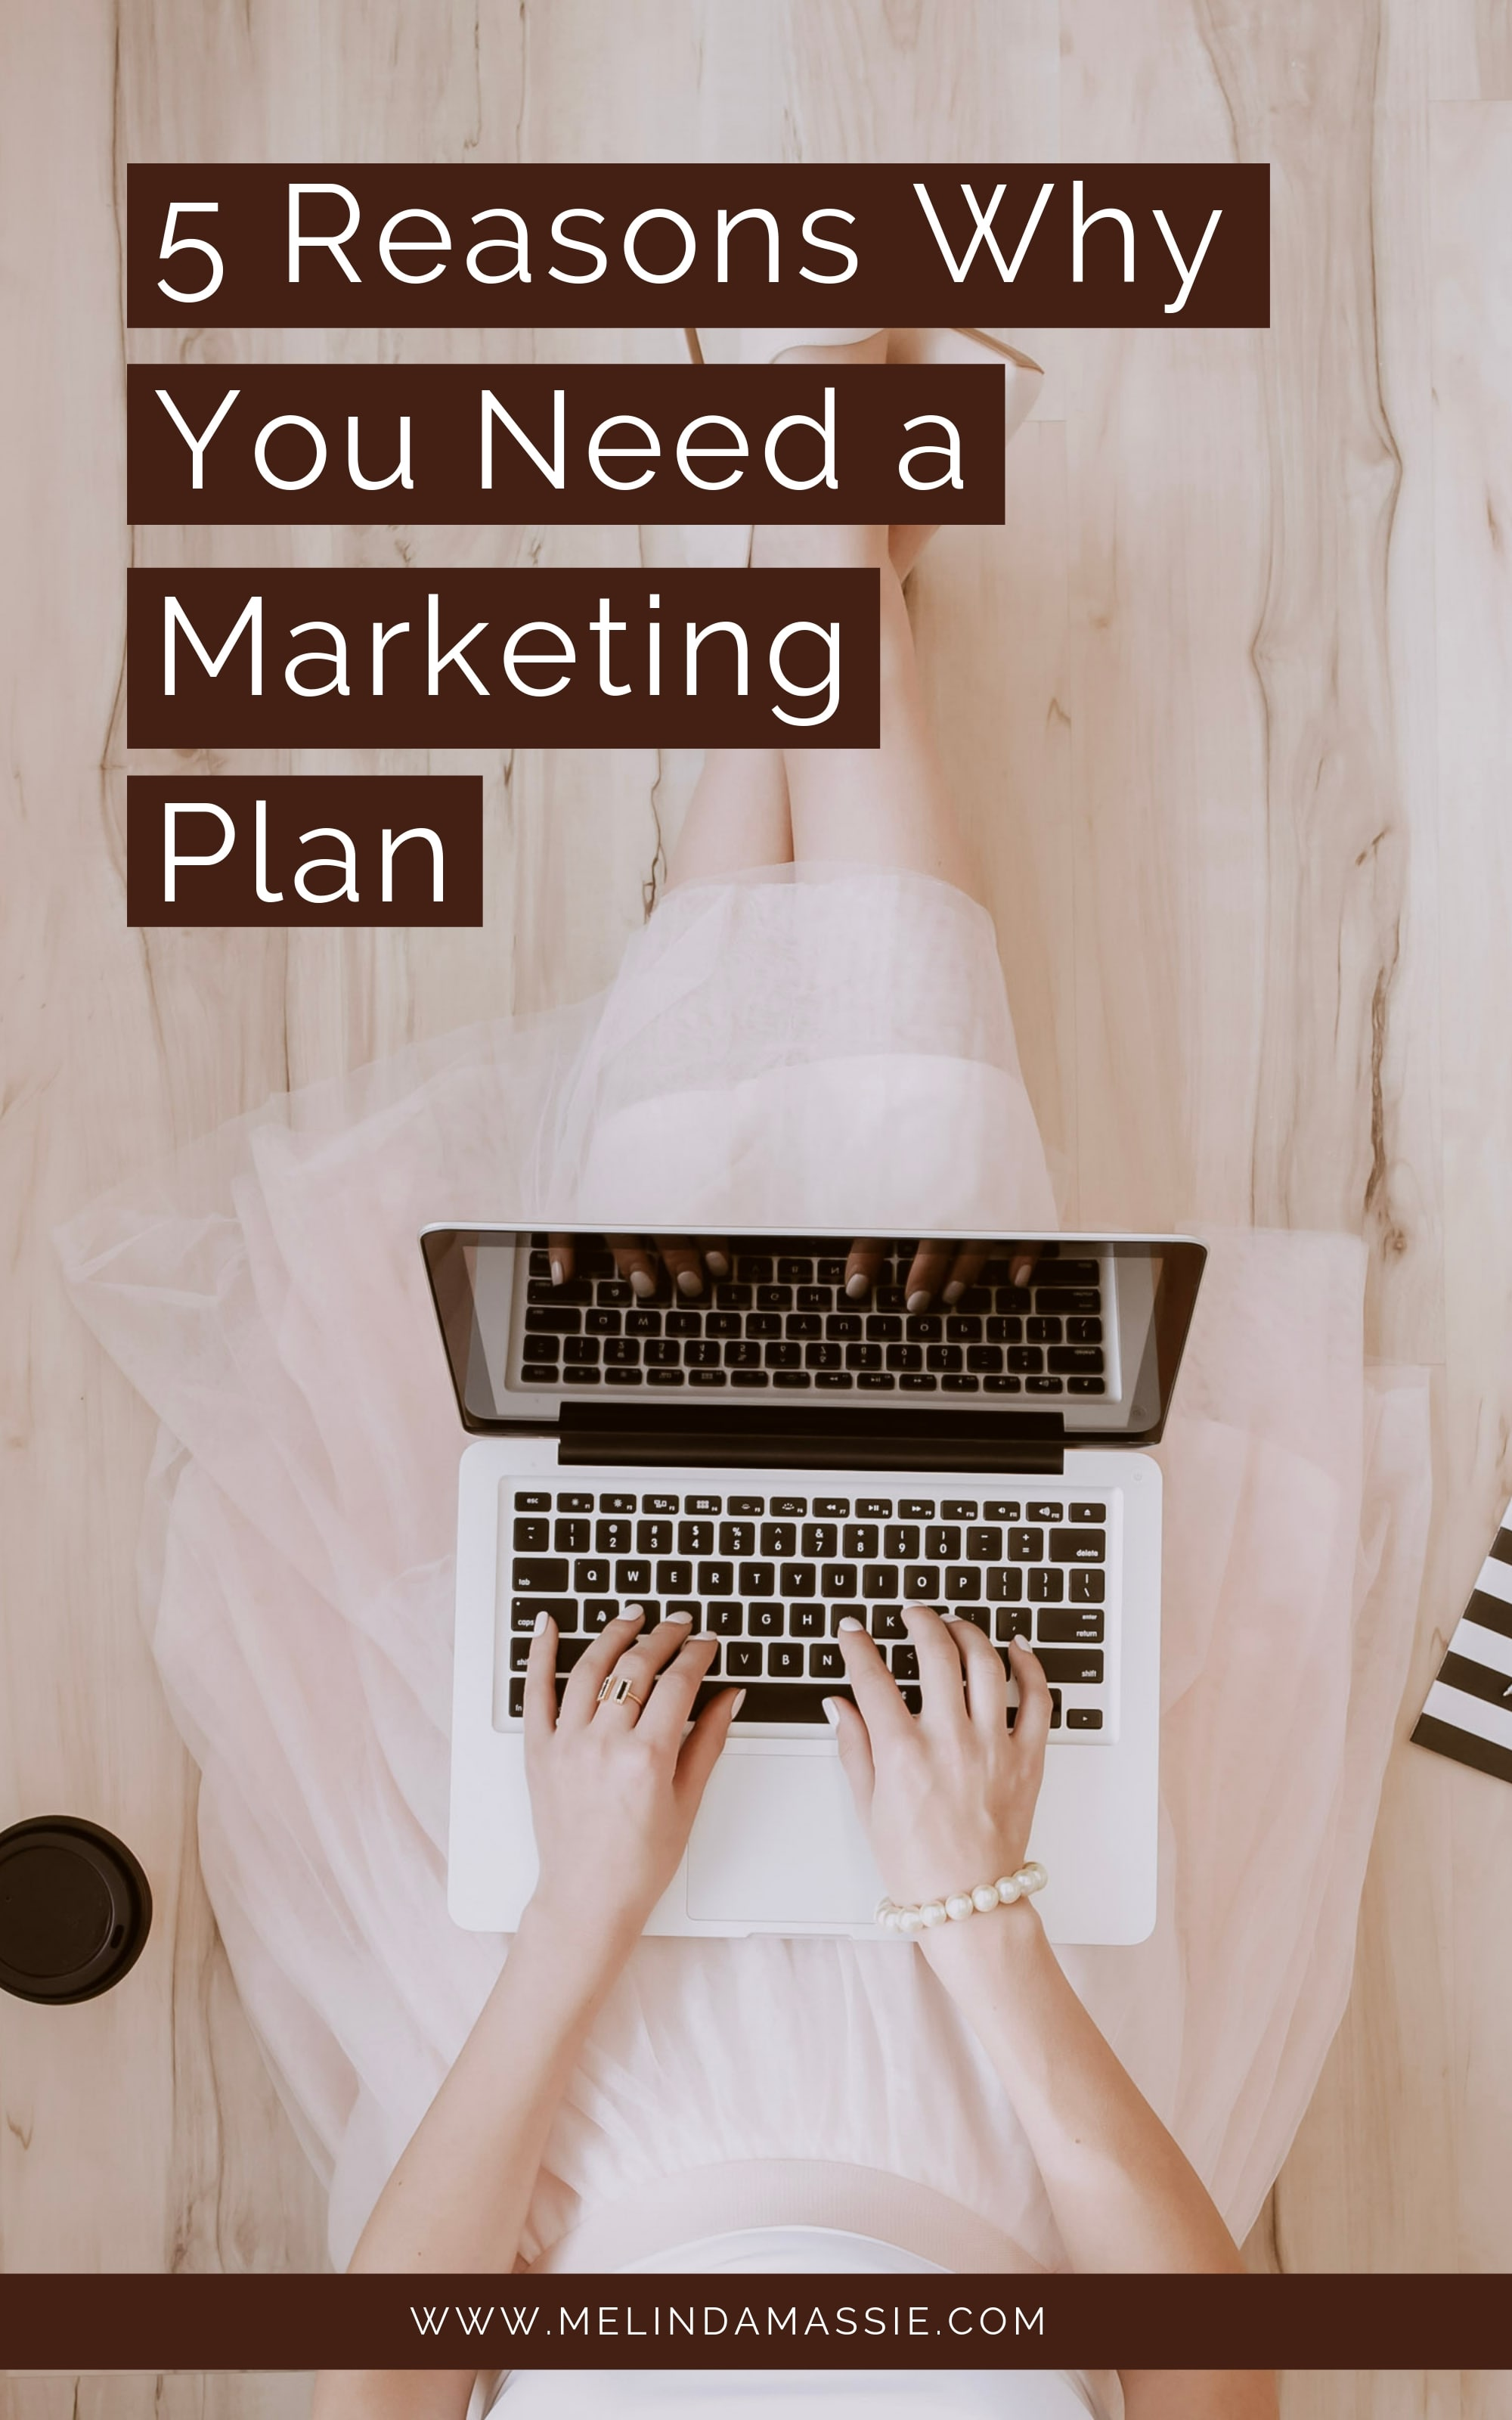 5 Reasons Why You Need a Marketing Plan - Melinda Massie Marketing Blog